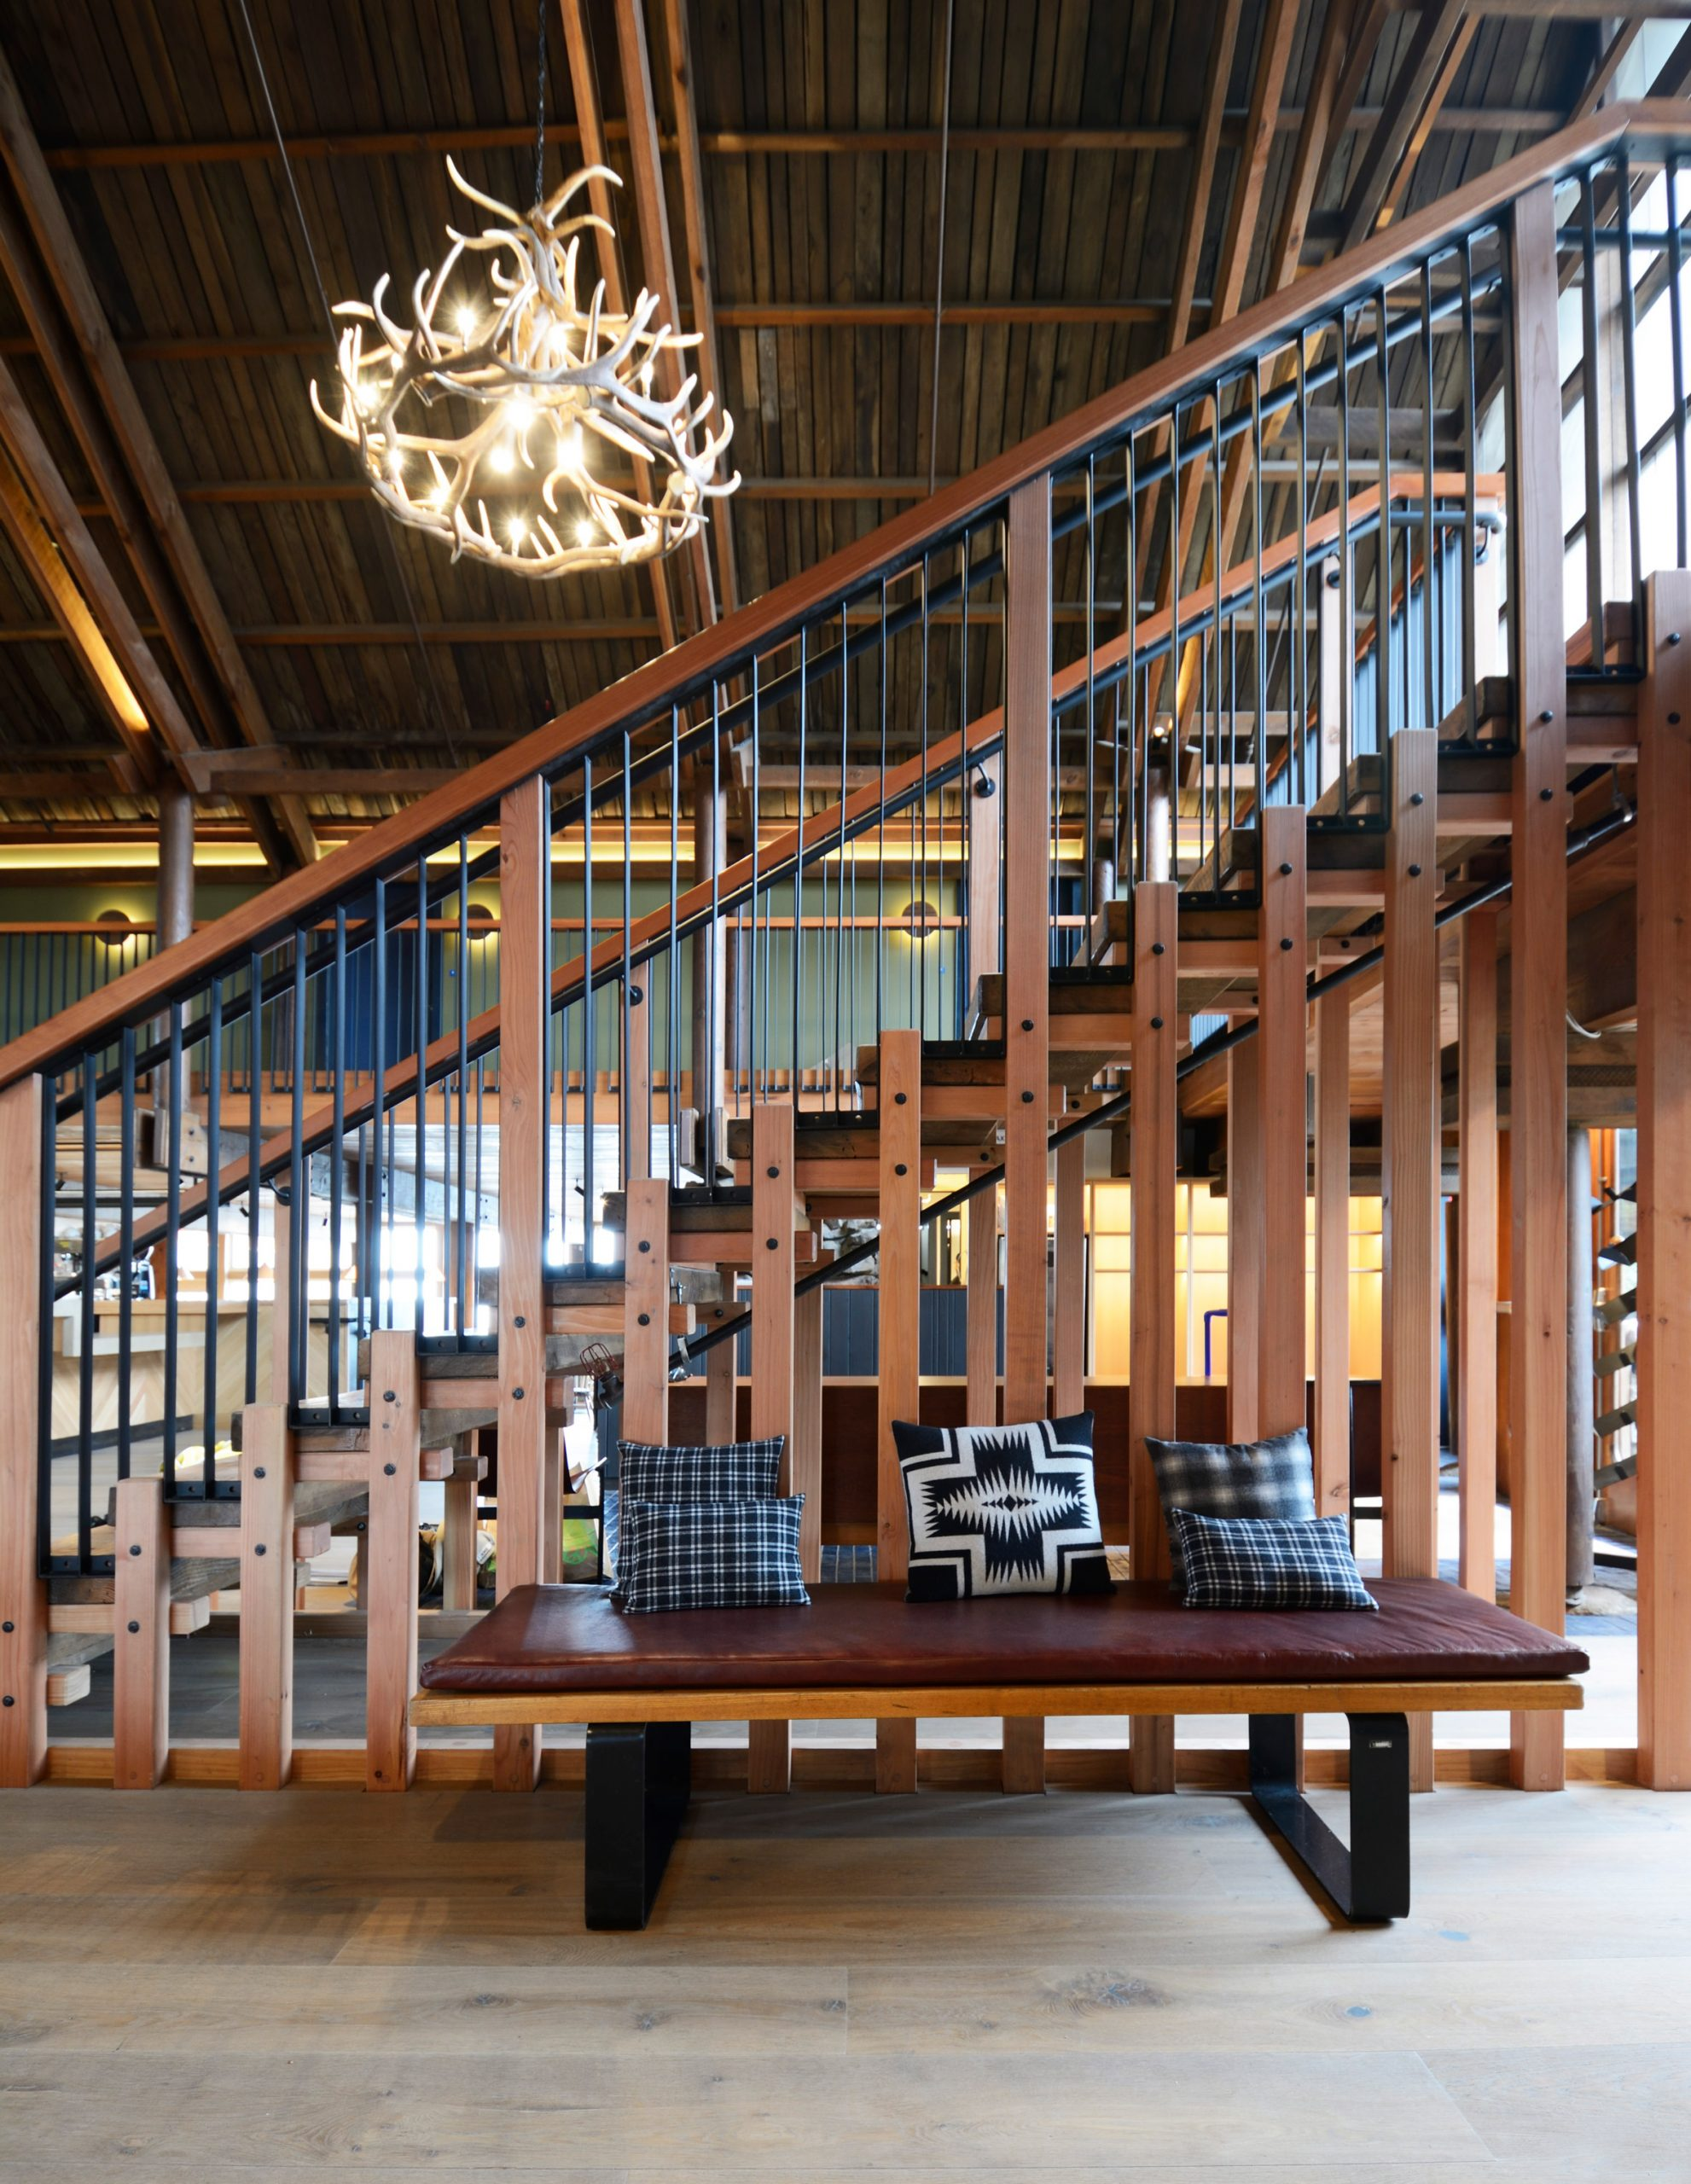 Thiết kế Resort biển 3